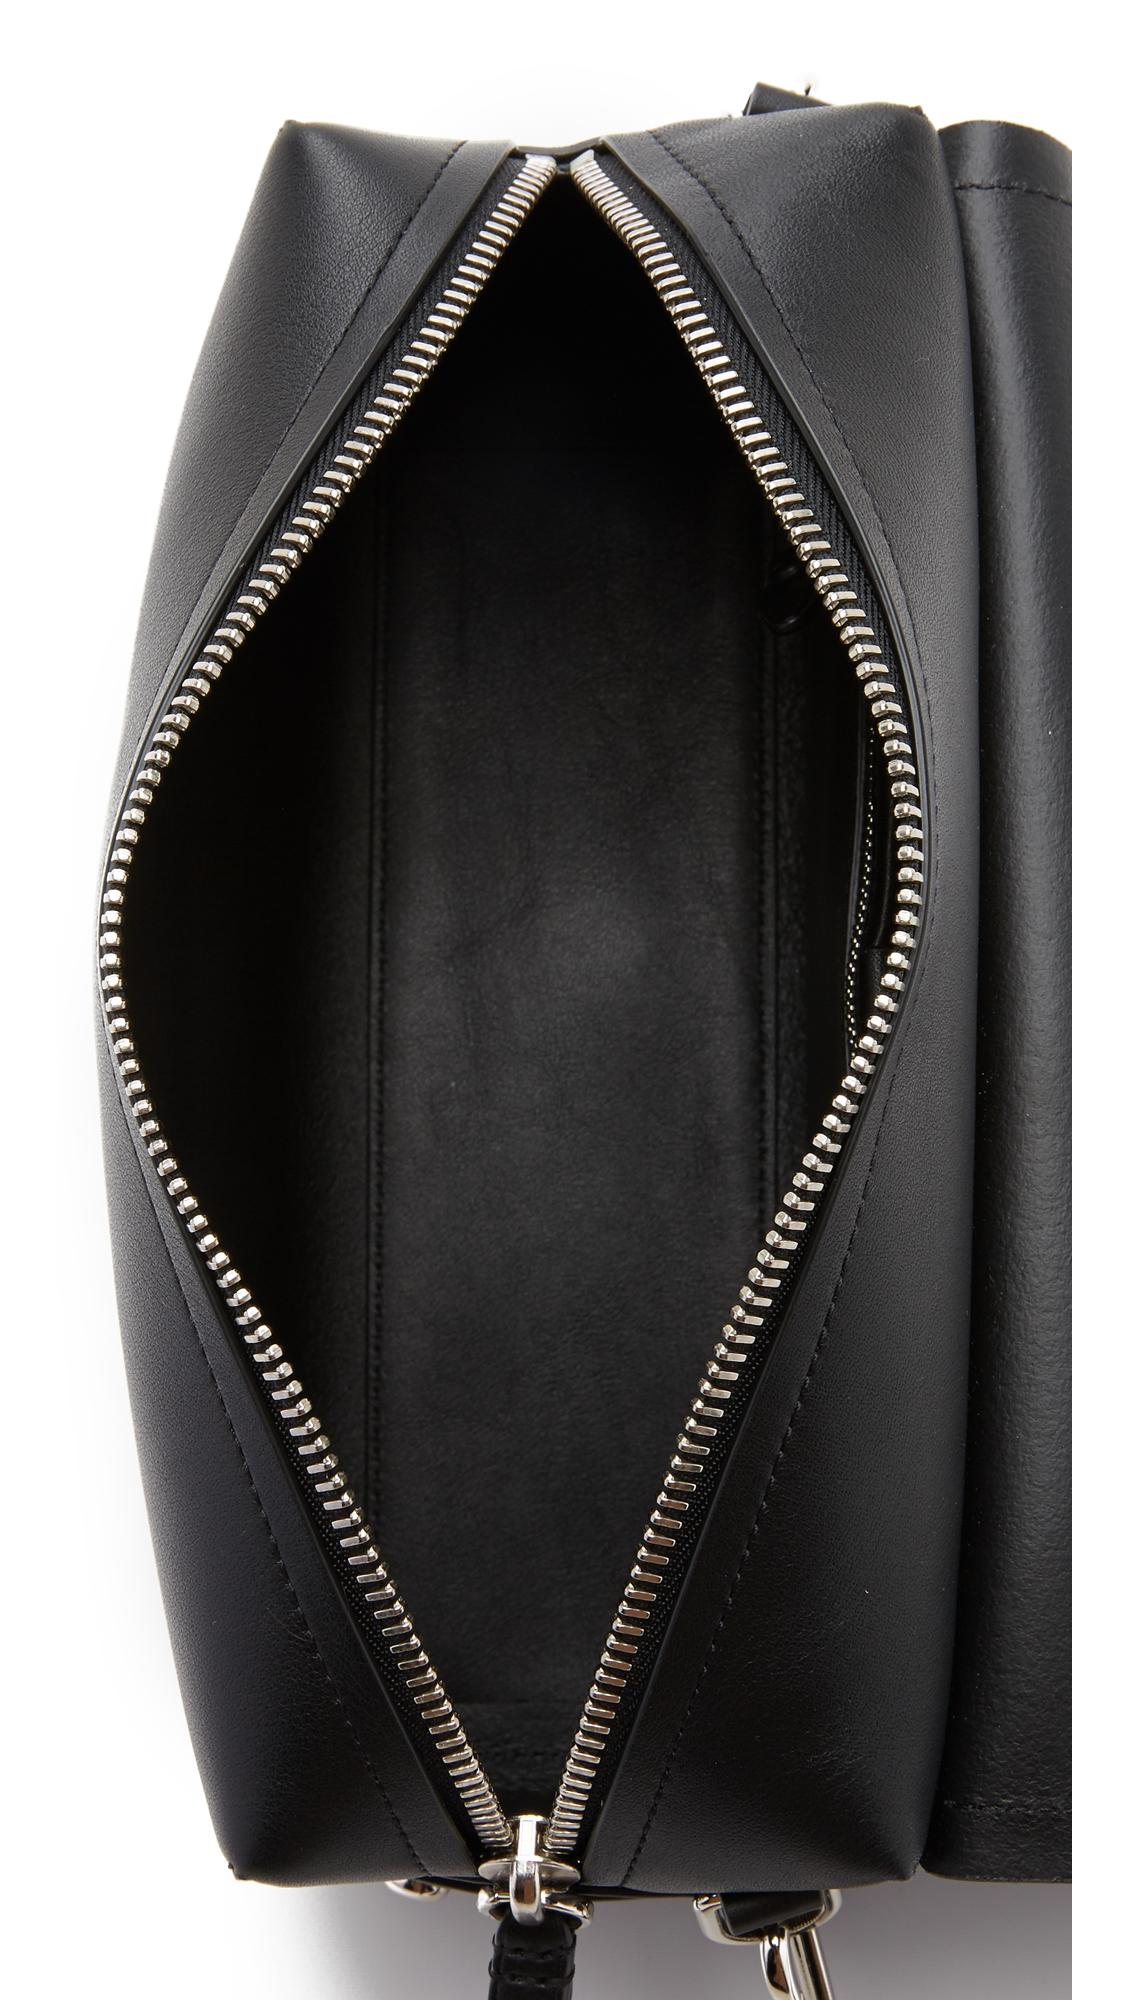 3.1 Phillip Lim Bianca Medium Flap Cross Body Bag in Black